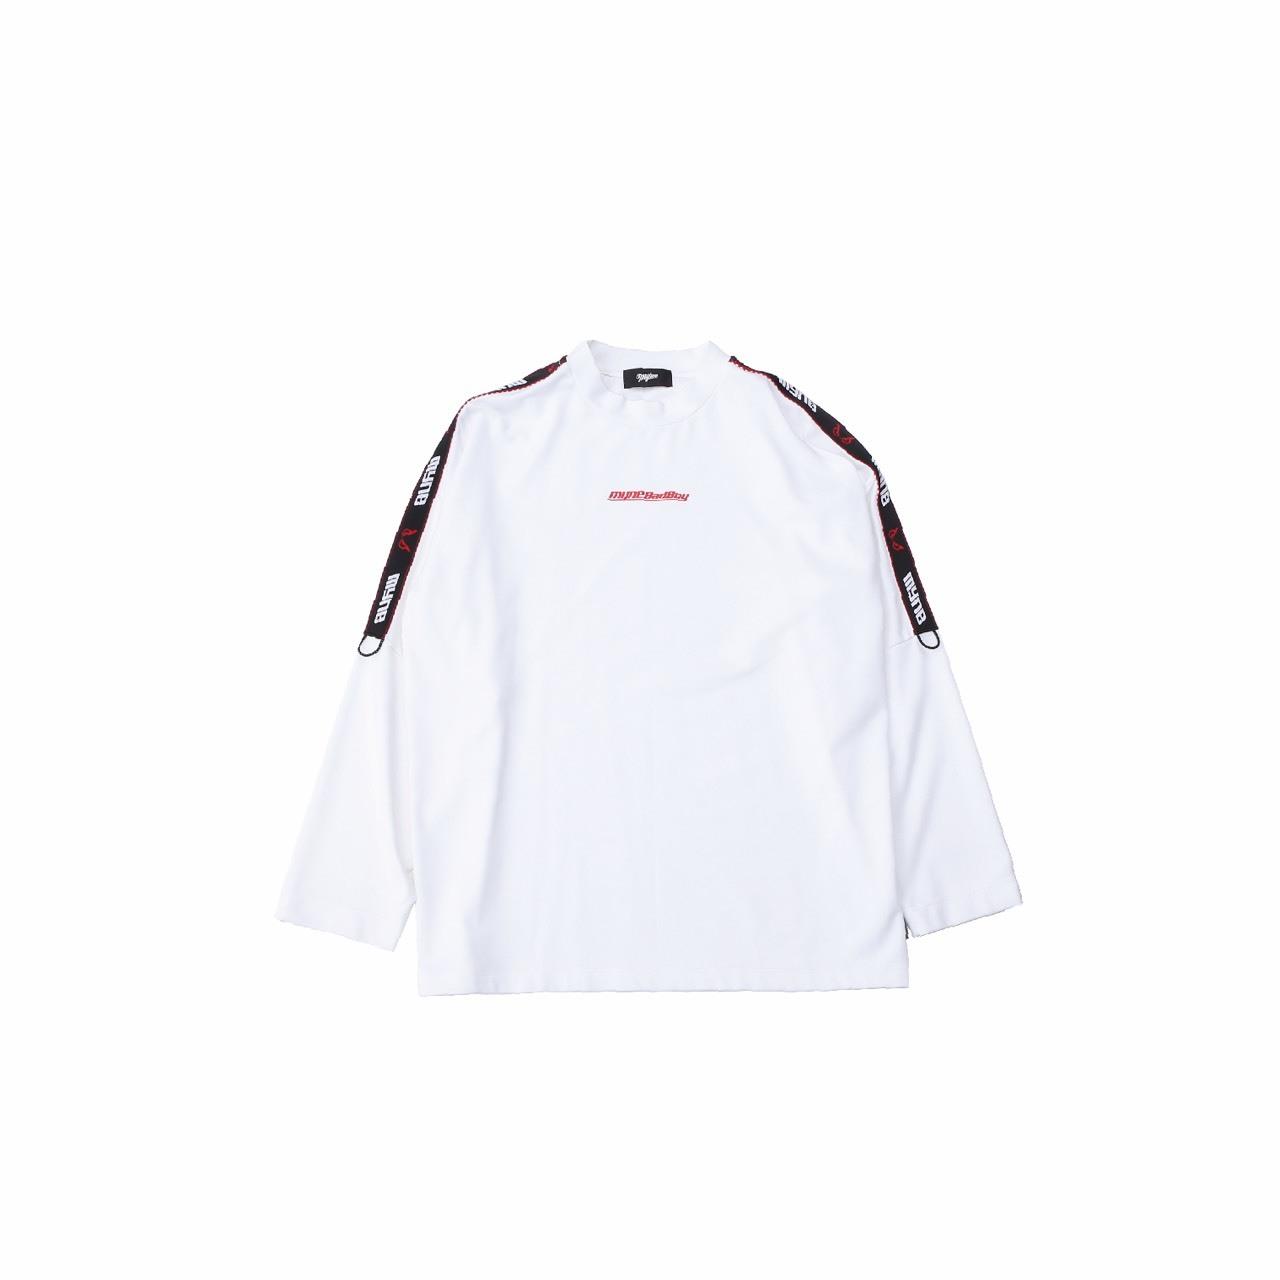 【10%OFF】MYne × BADBOY L/S T-shirt / WHITE - 画像1